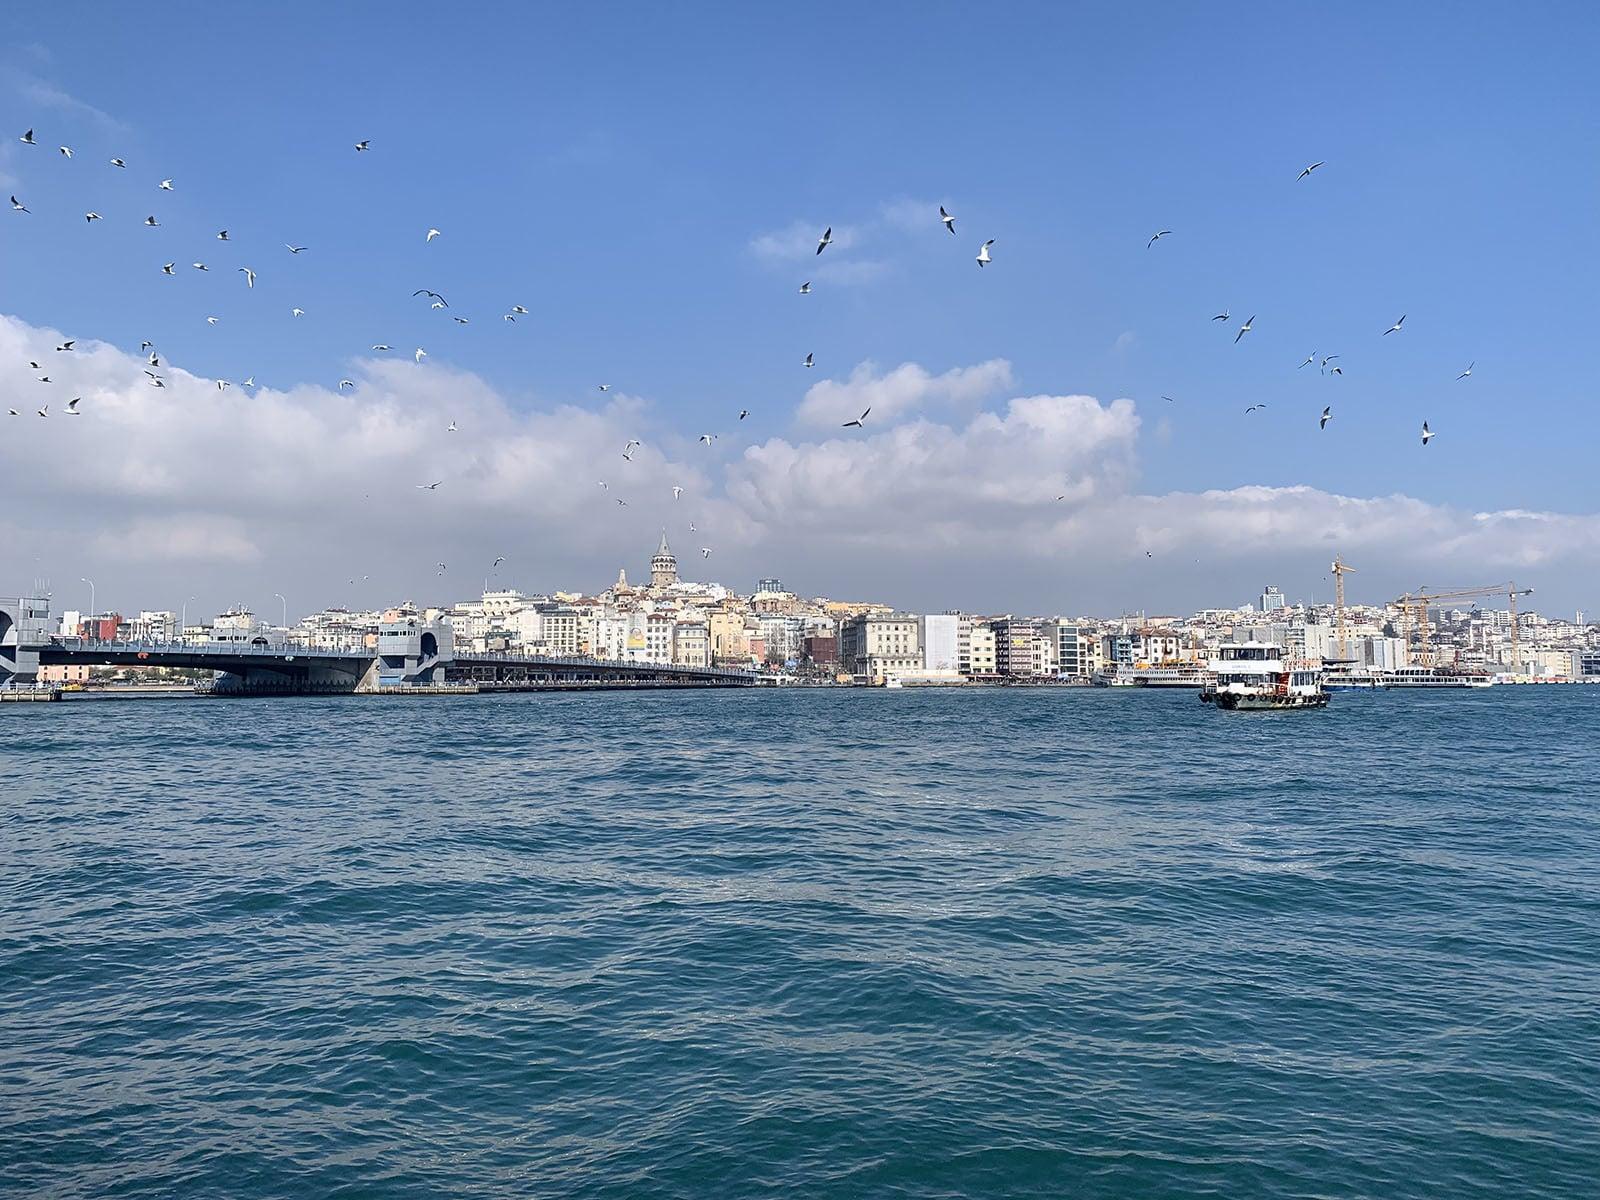 The Beyoğlu skyline seen from the bustling Eminönü harbourside.